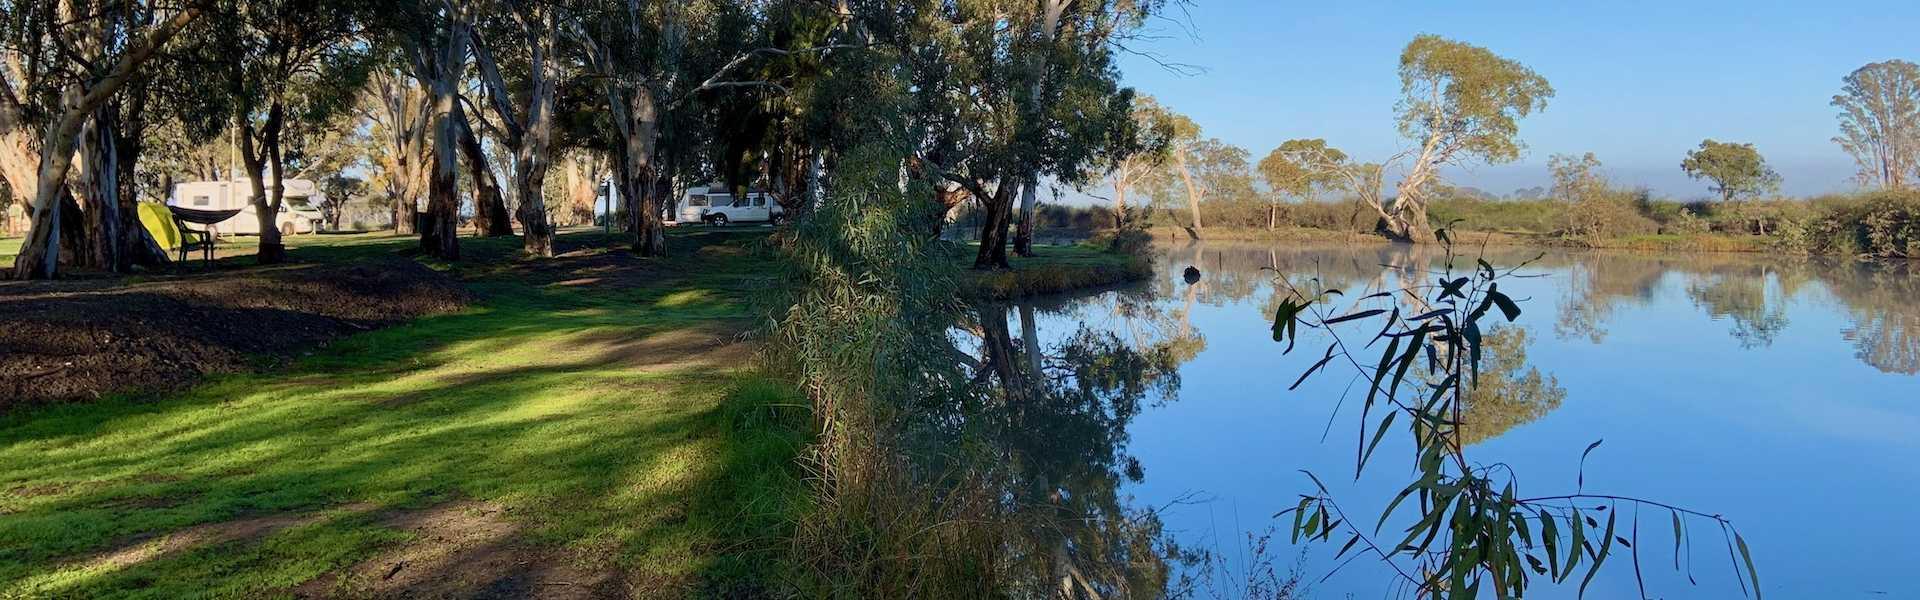 Kui Parks, Kerang Caravan & Tourist Park, Loddon RIver